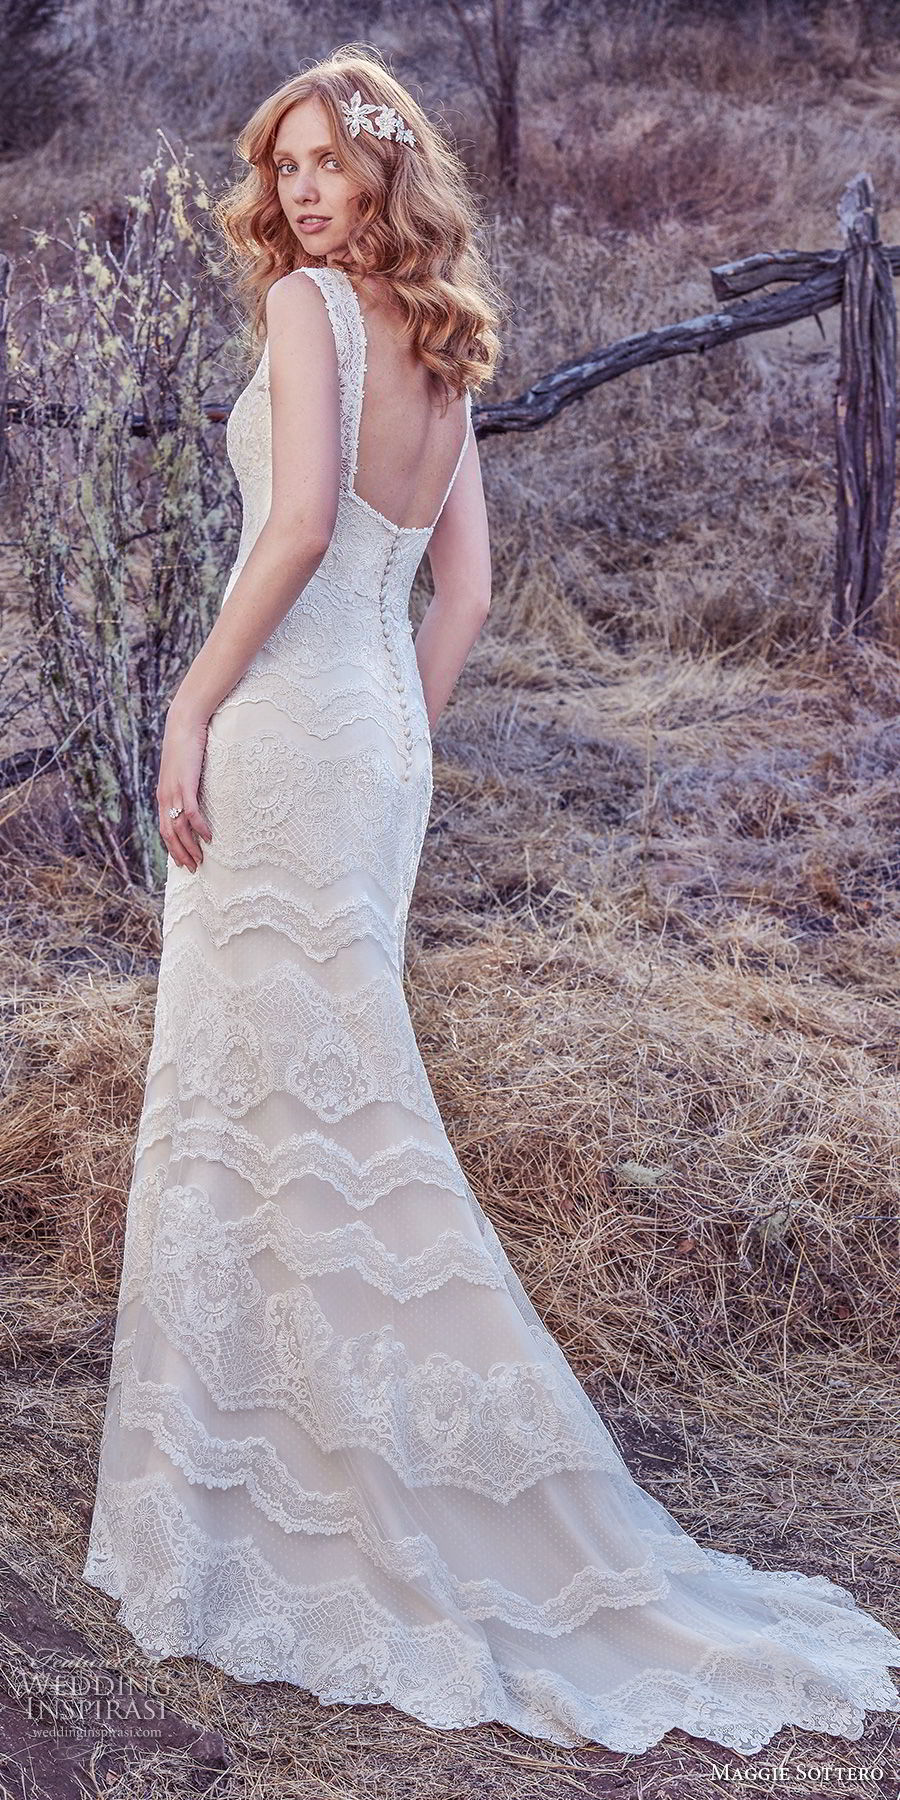 Maggie Sottero Blush Wedding Dress 98 New maggie sottero fall bridal